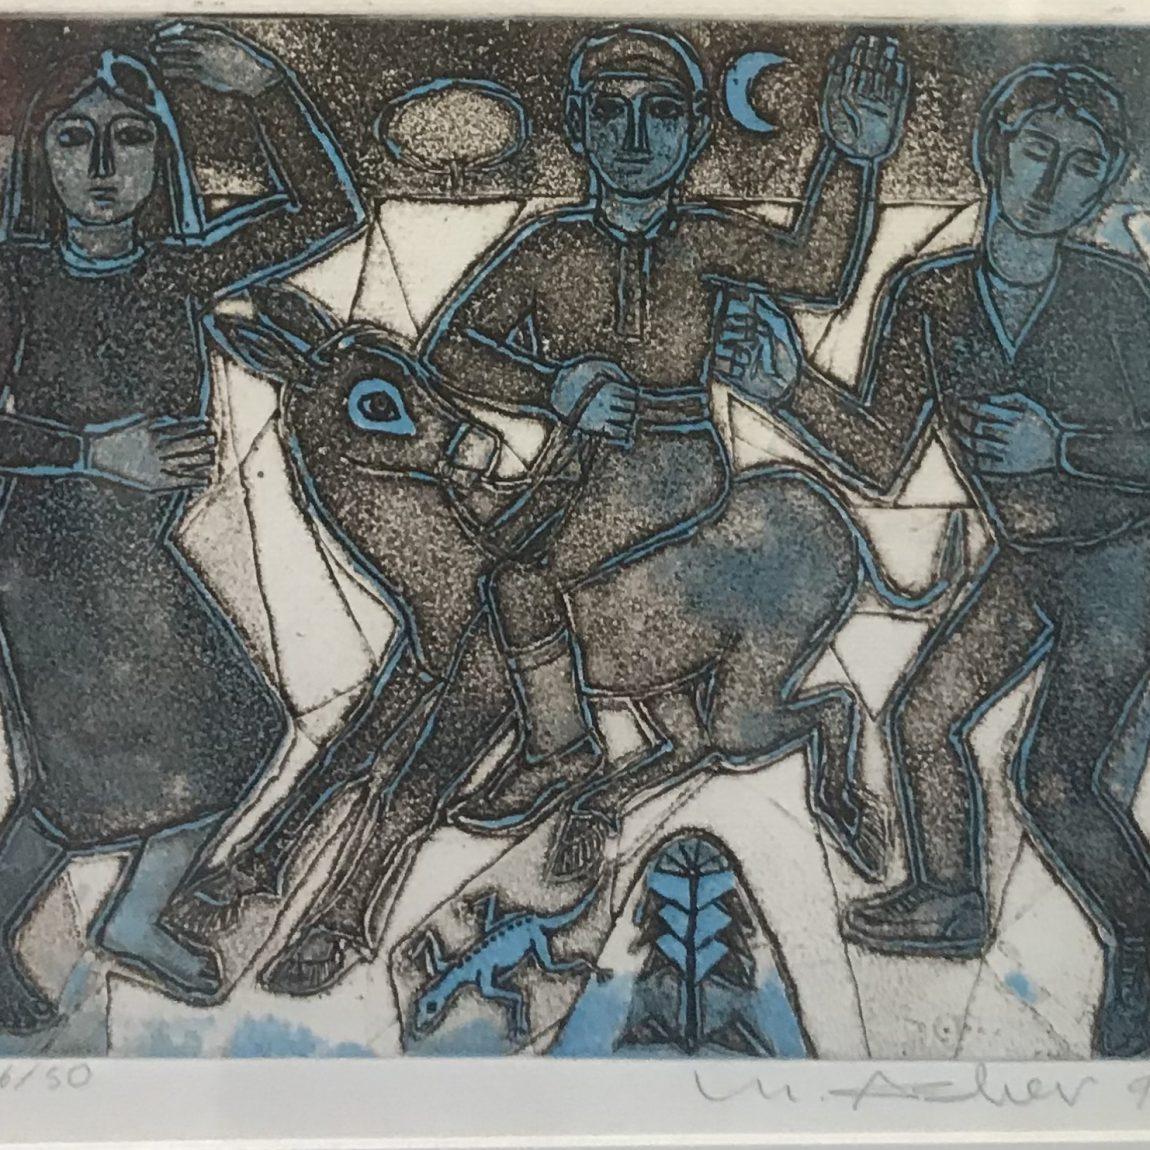 Mustafa Aslıer - Teknik: Baskı - Ölçü : 27 x 23 cm Fiyat : 5.000 TL